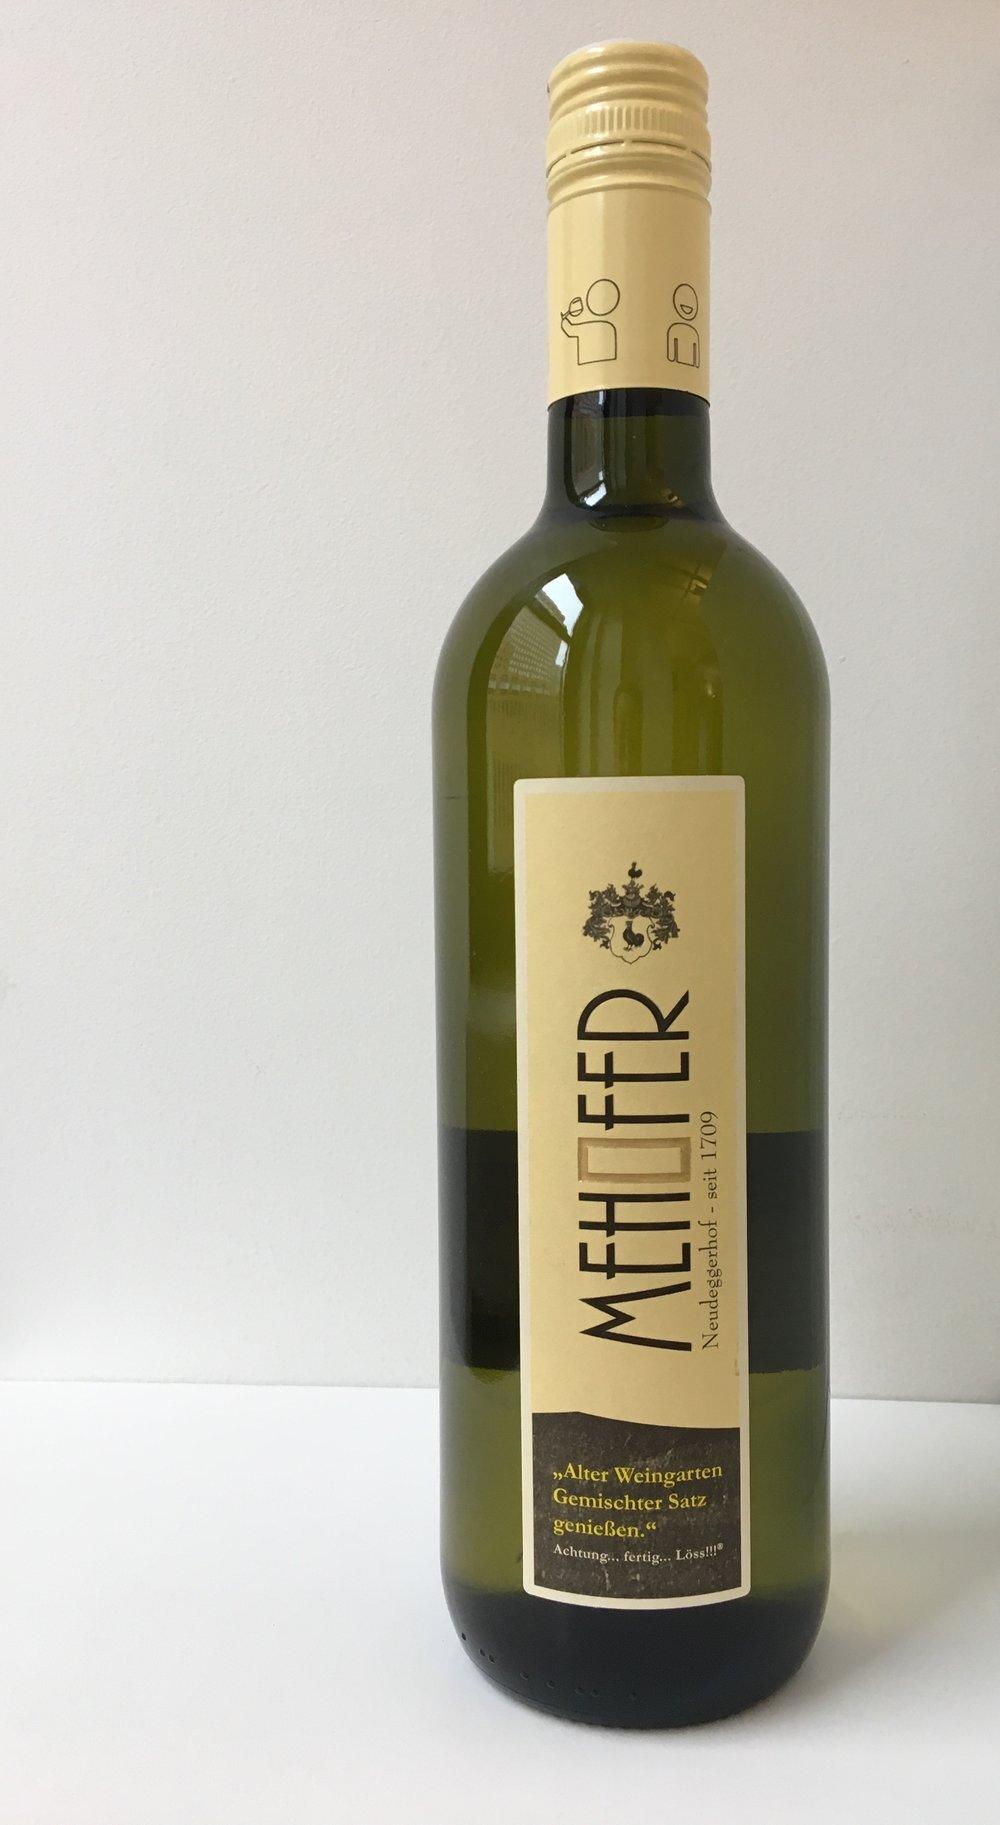 Alter Weingarten Gemischter Satz bottle pic.jpeg